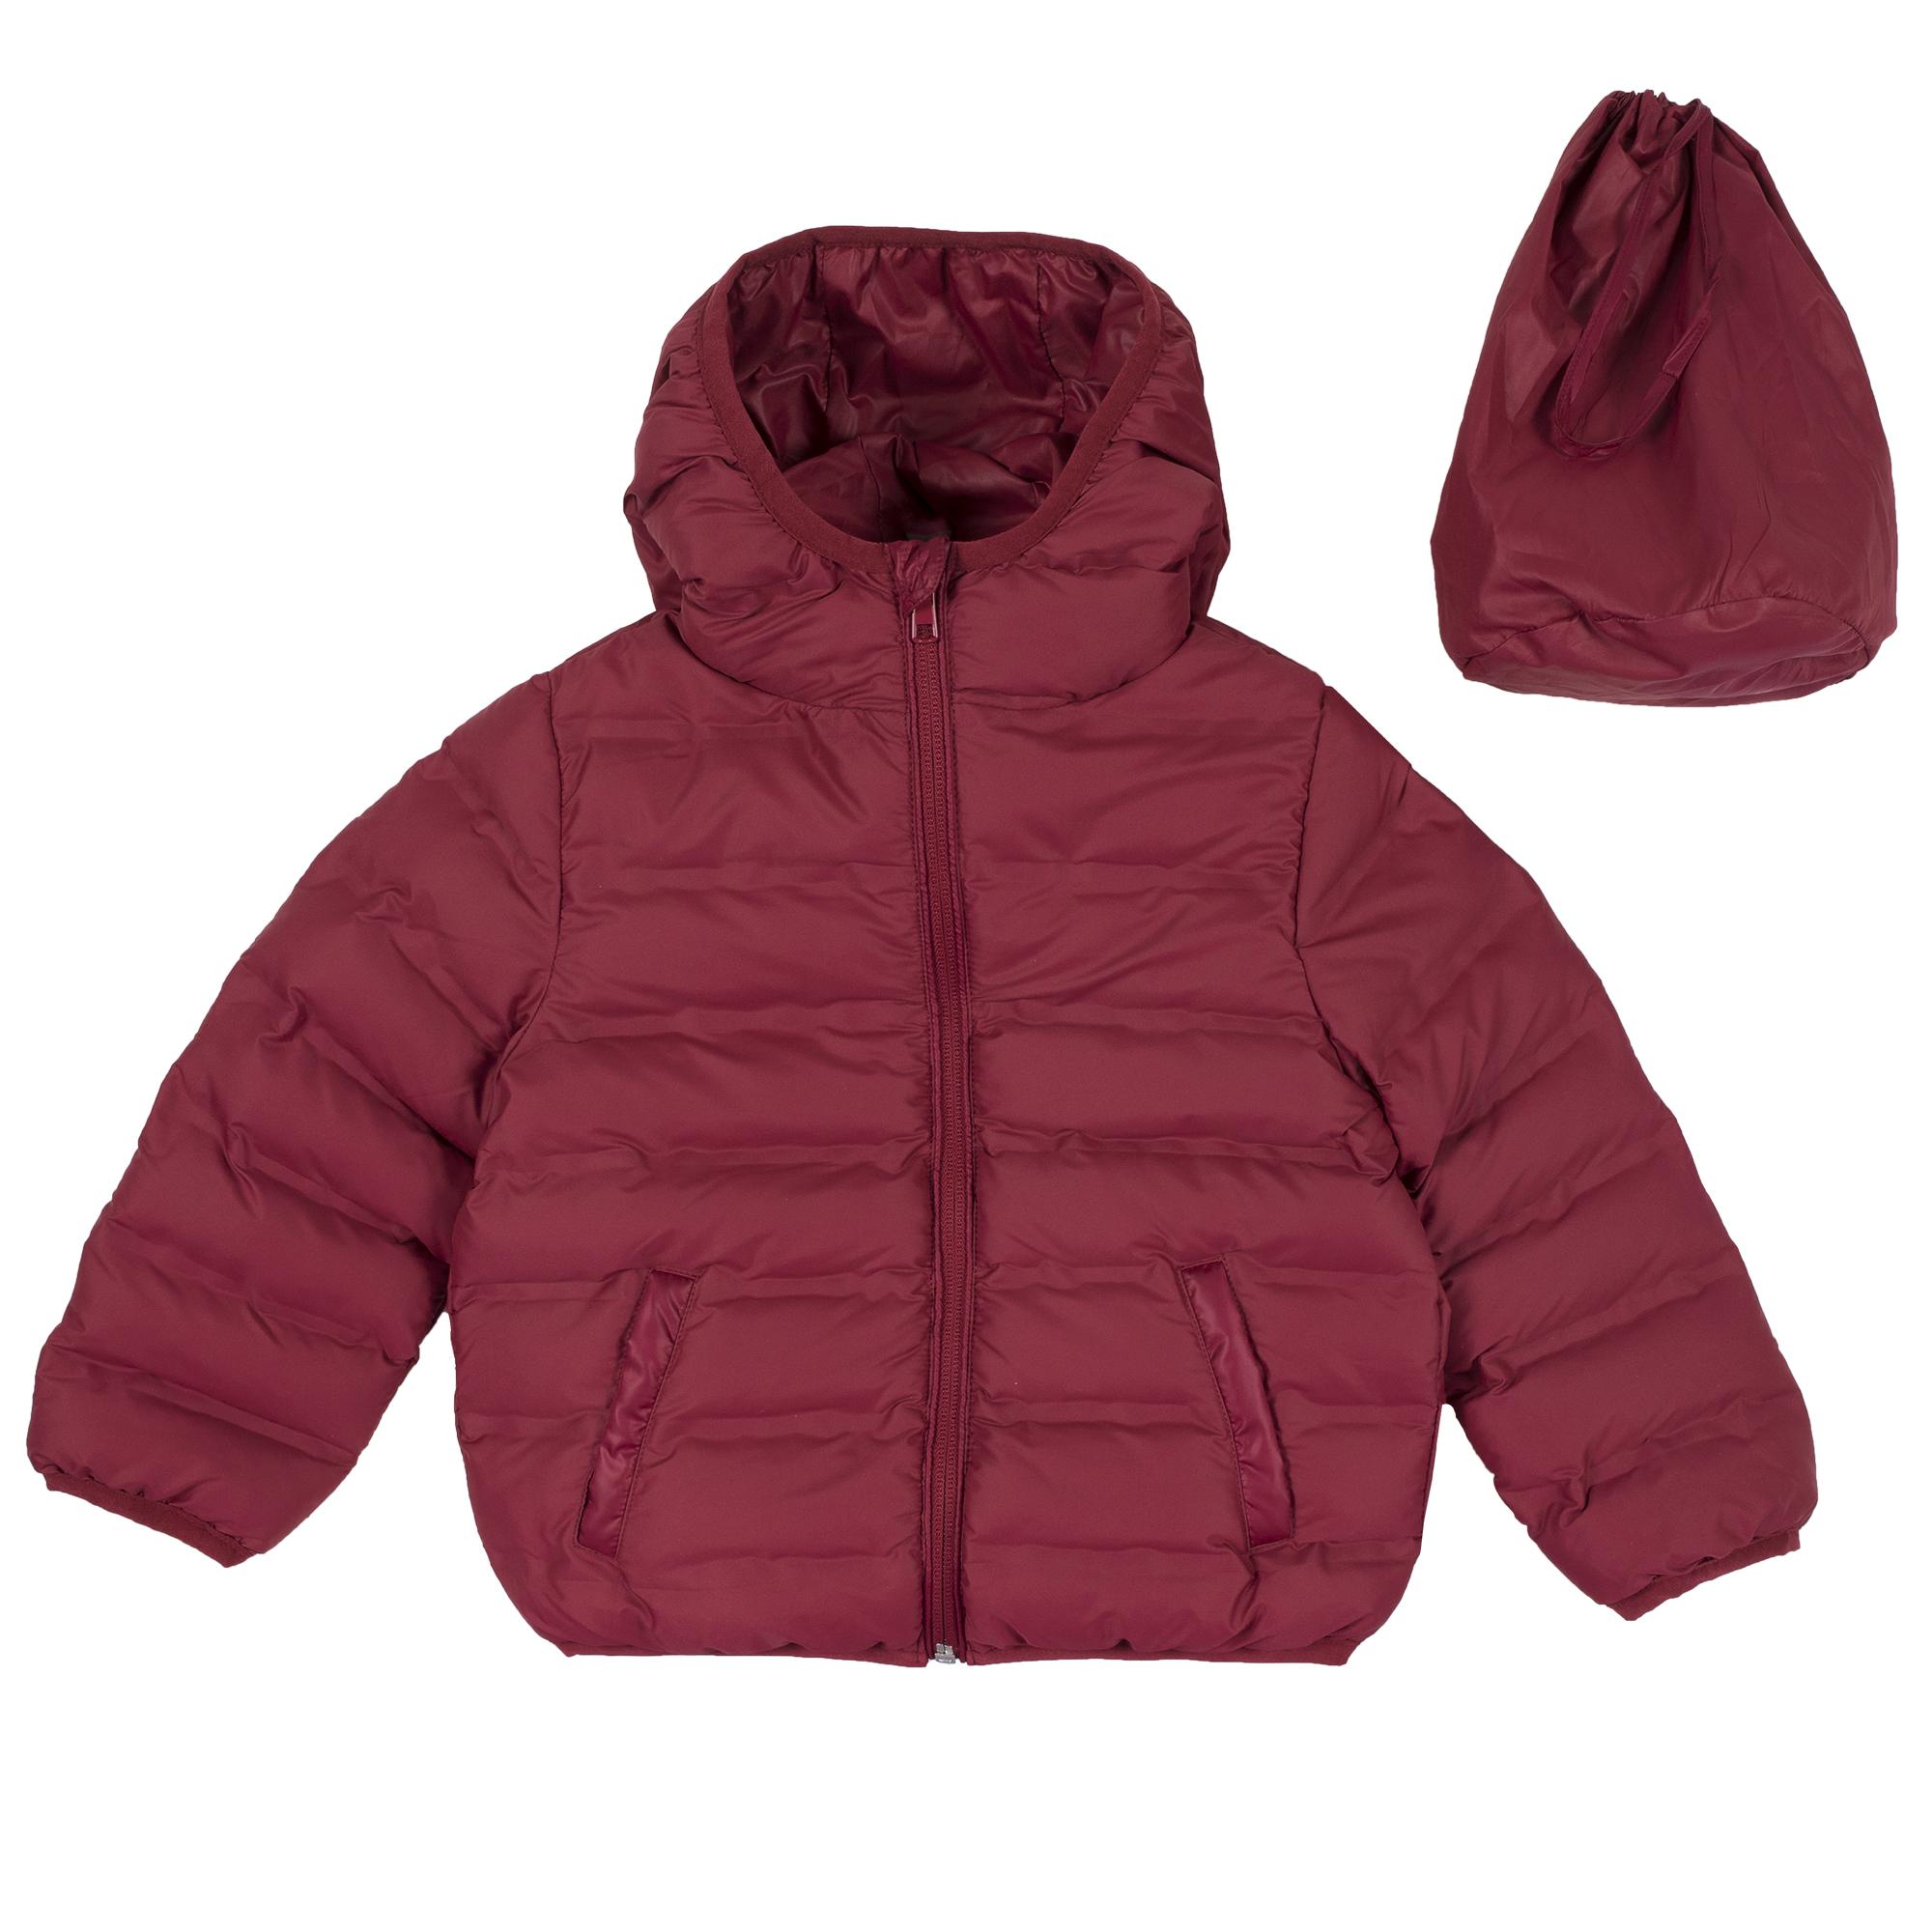 Jacheta copii Chicco, impermeabila si matlasata, visiniu, 87404